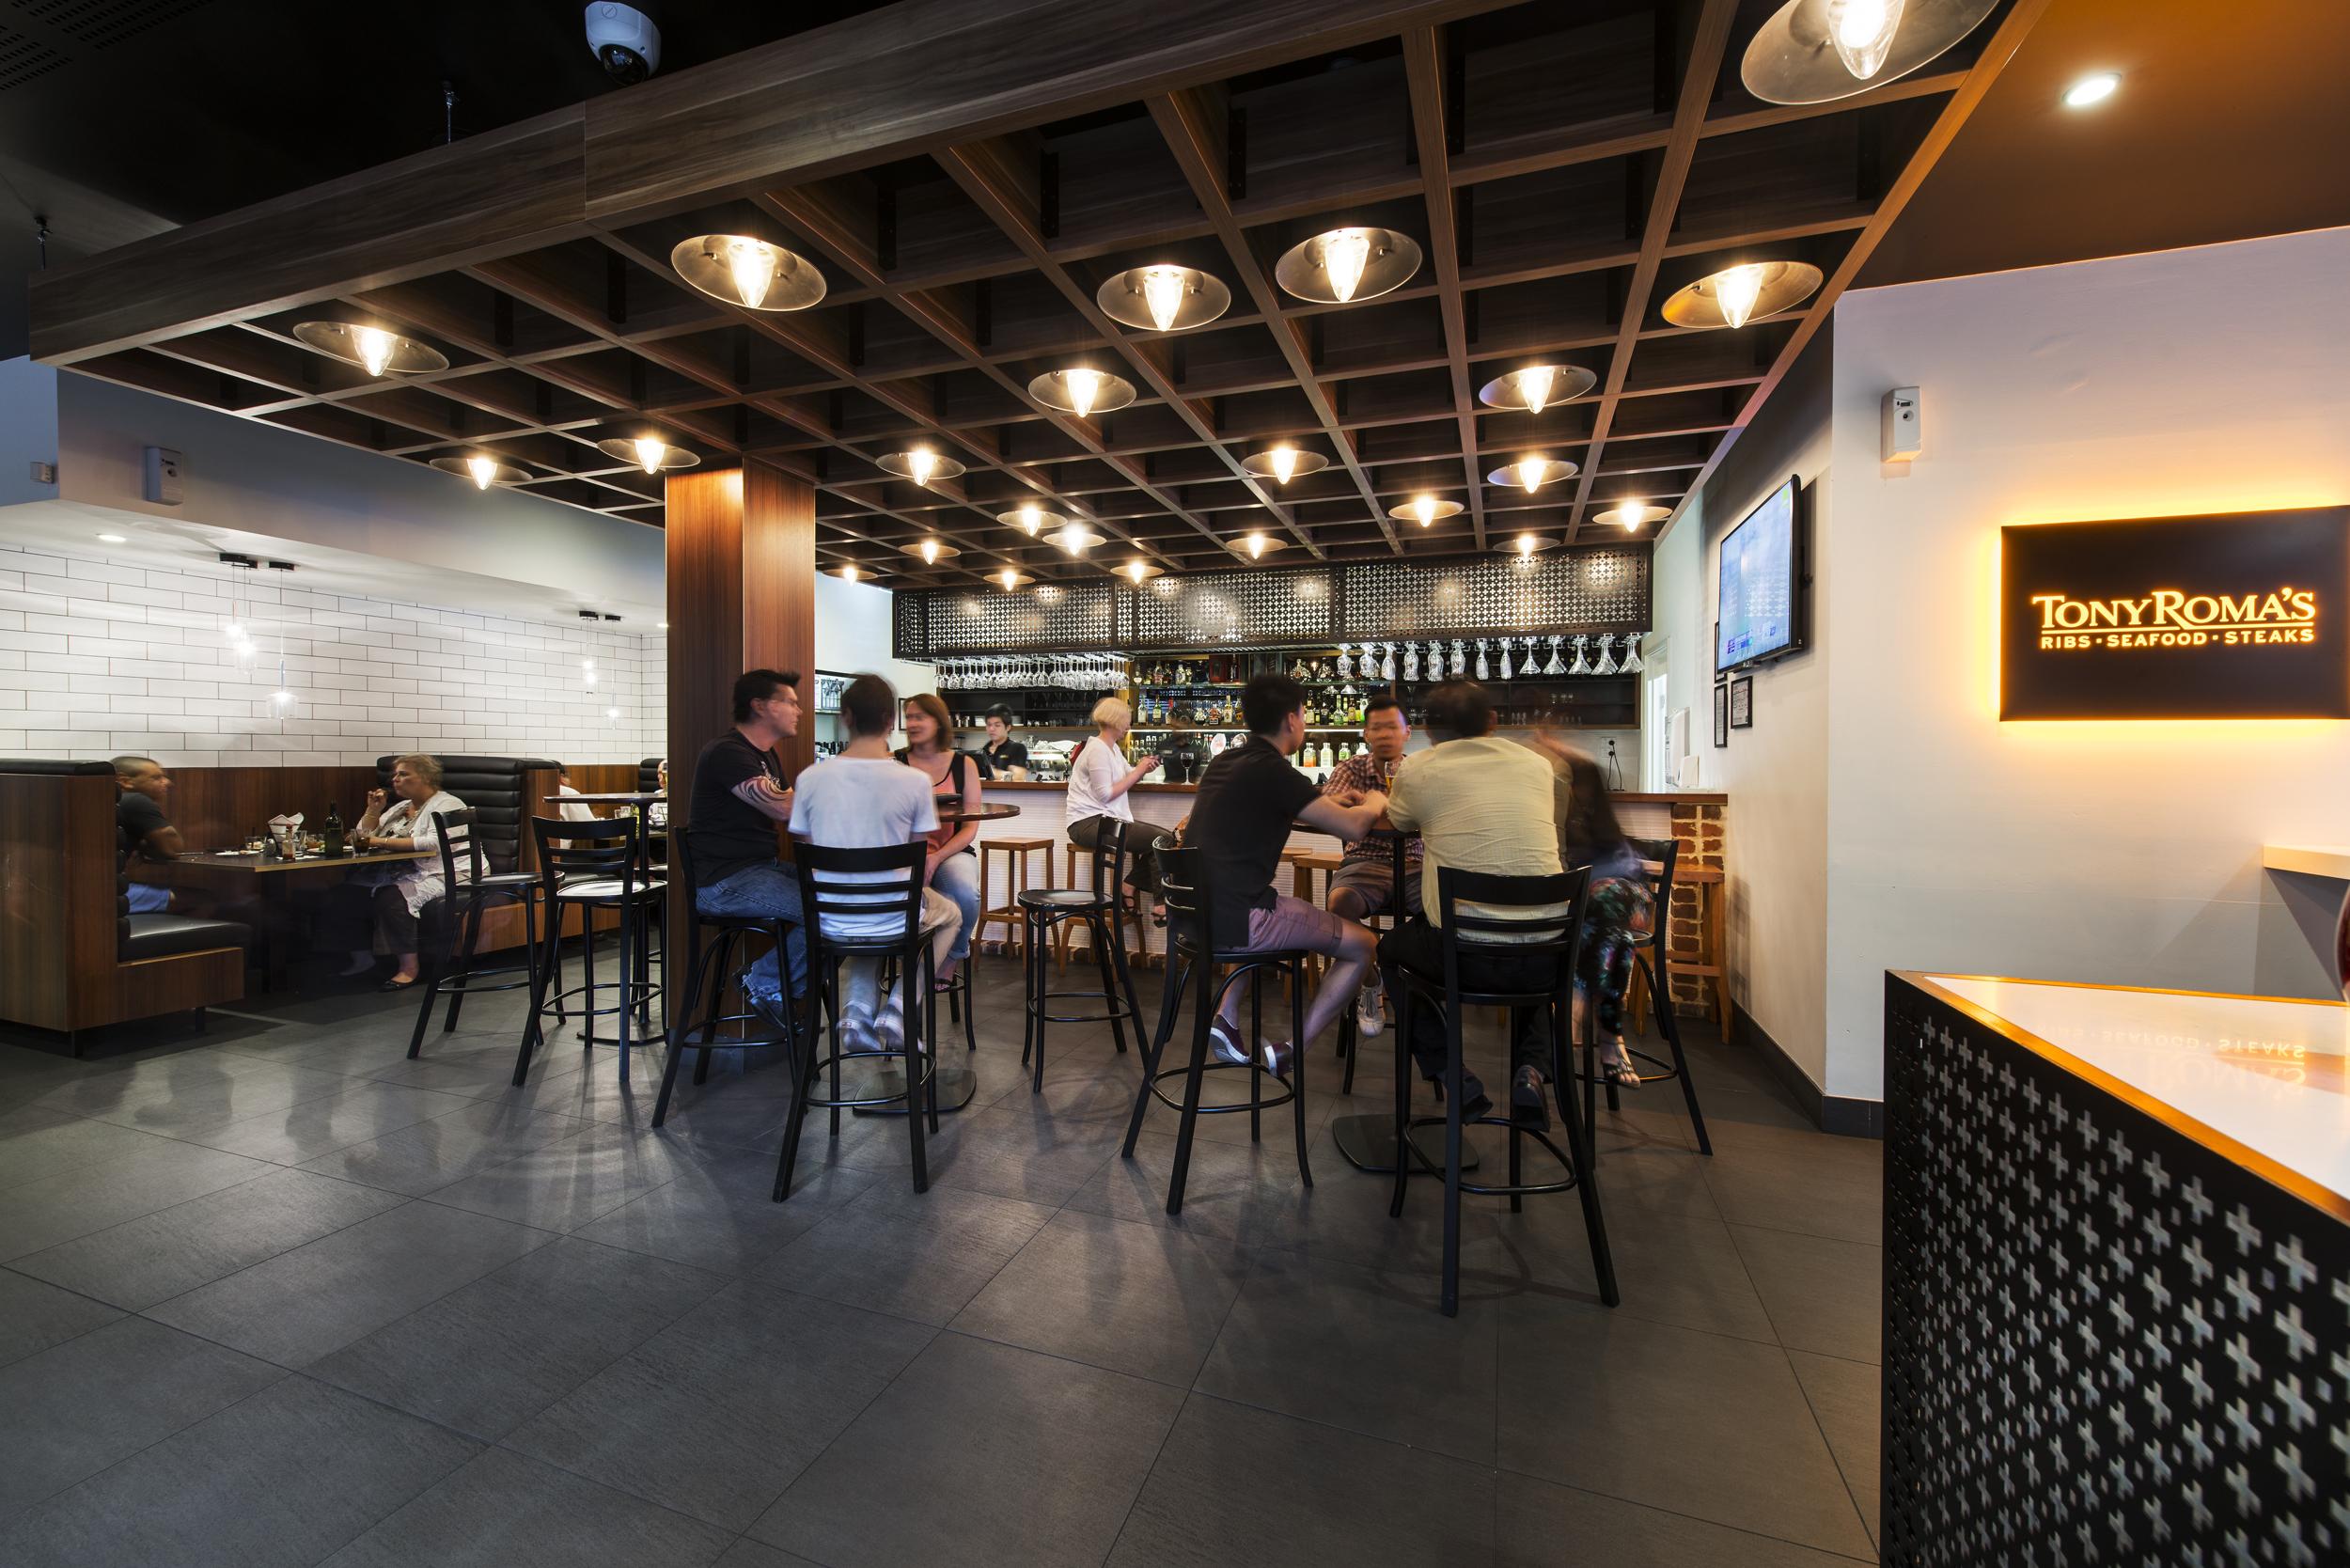 interior-tony-romas-perth-restaurant-western-australia-architecture-design-architect-commercial.jpg